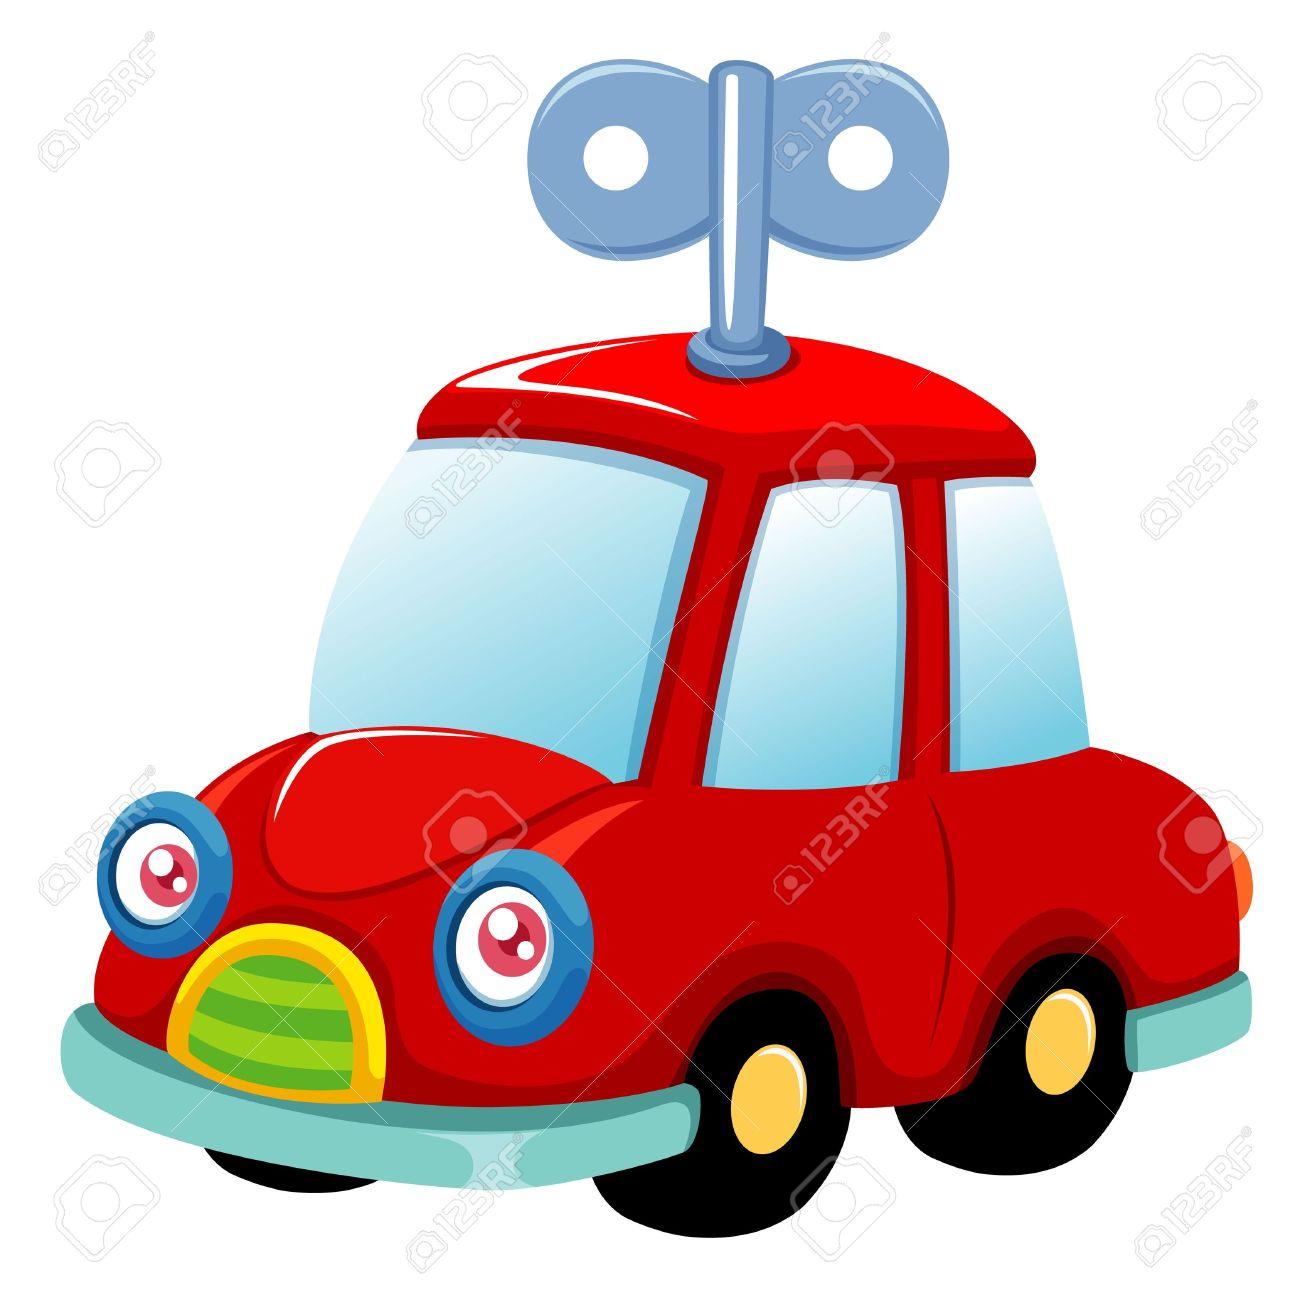 Toy Car Clip Art : Toy car clipart clipground